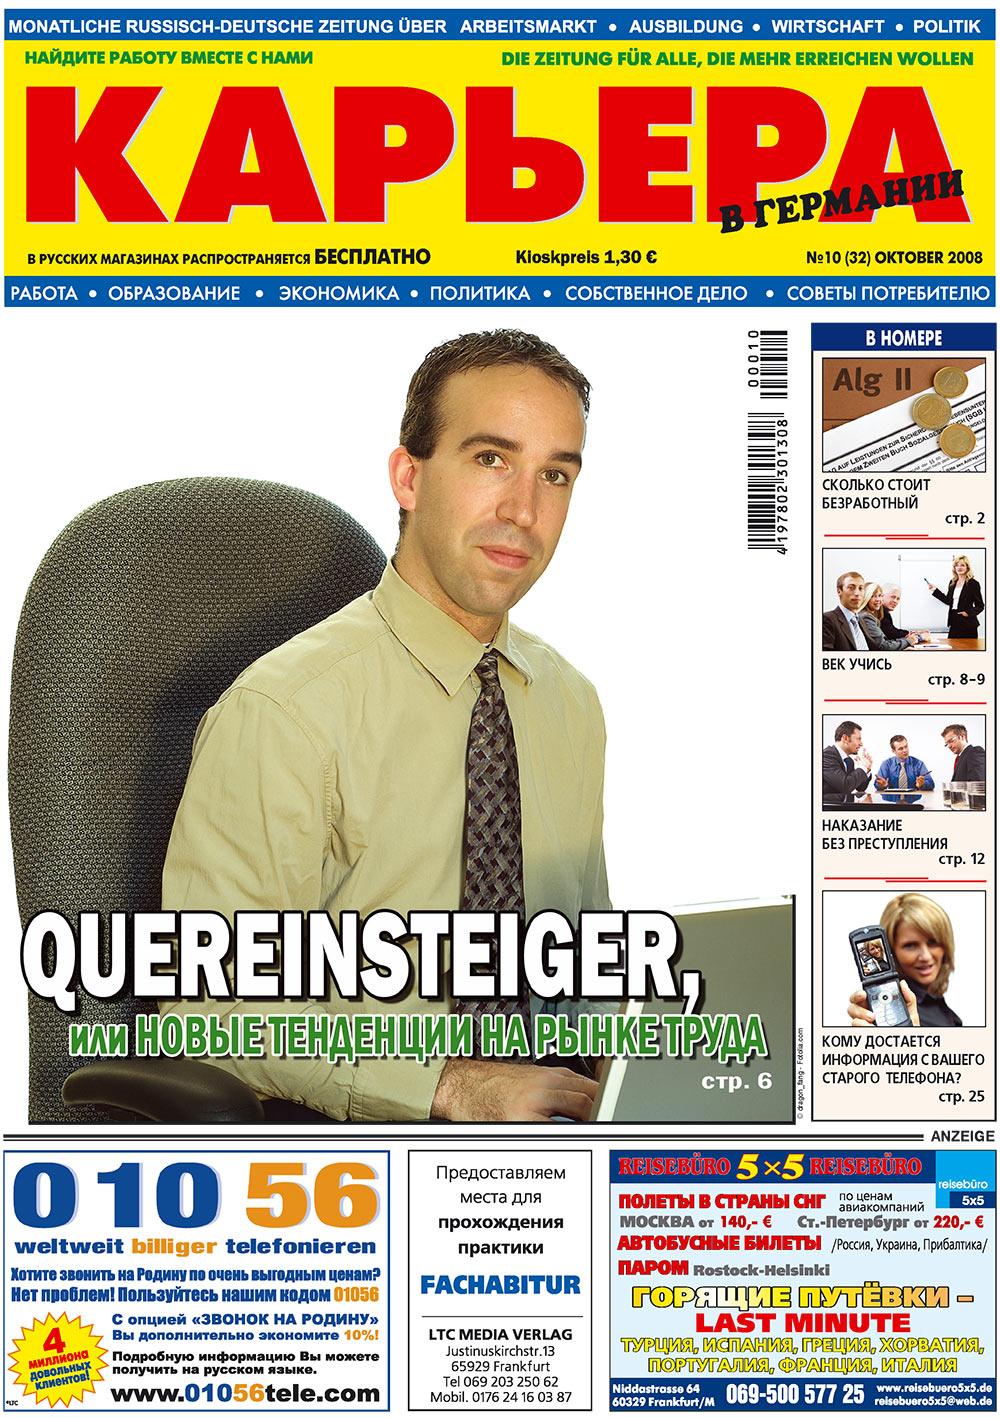 Карьера (газета). 2008 год, номер 10, стр. 1